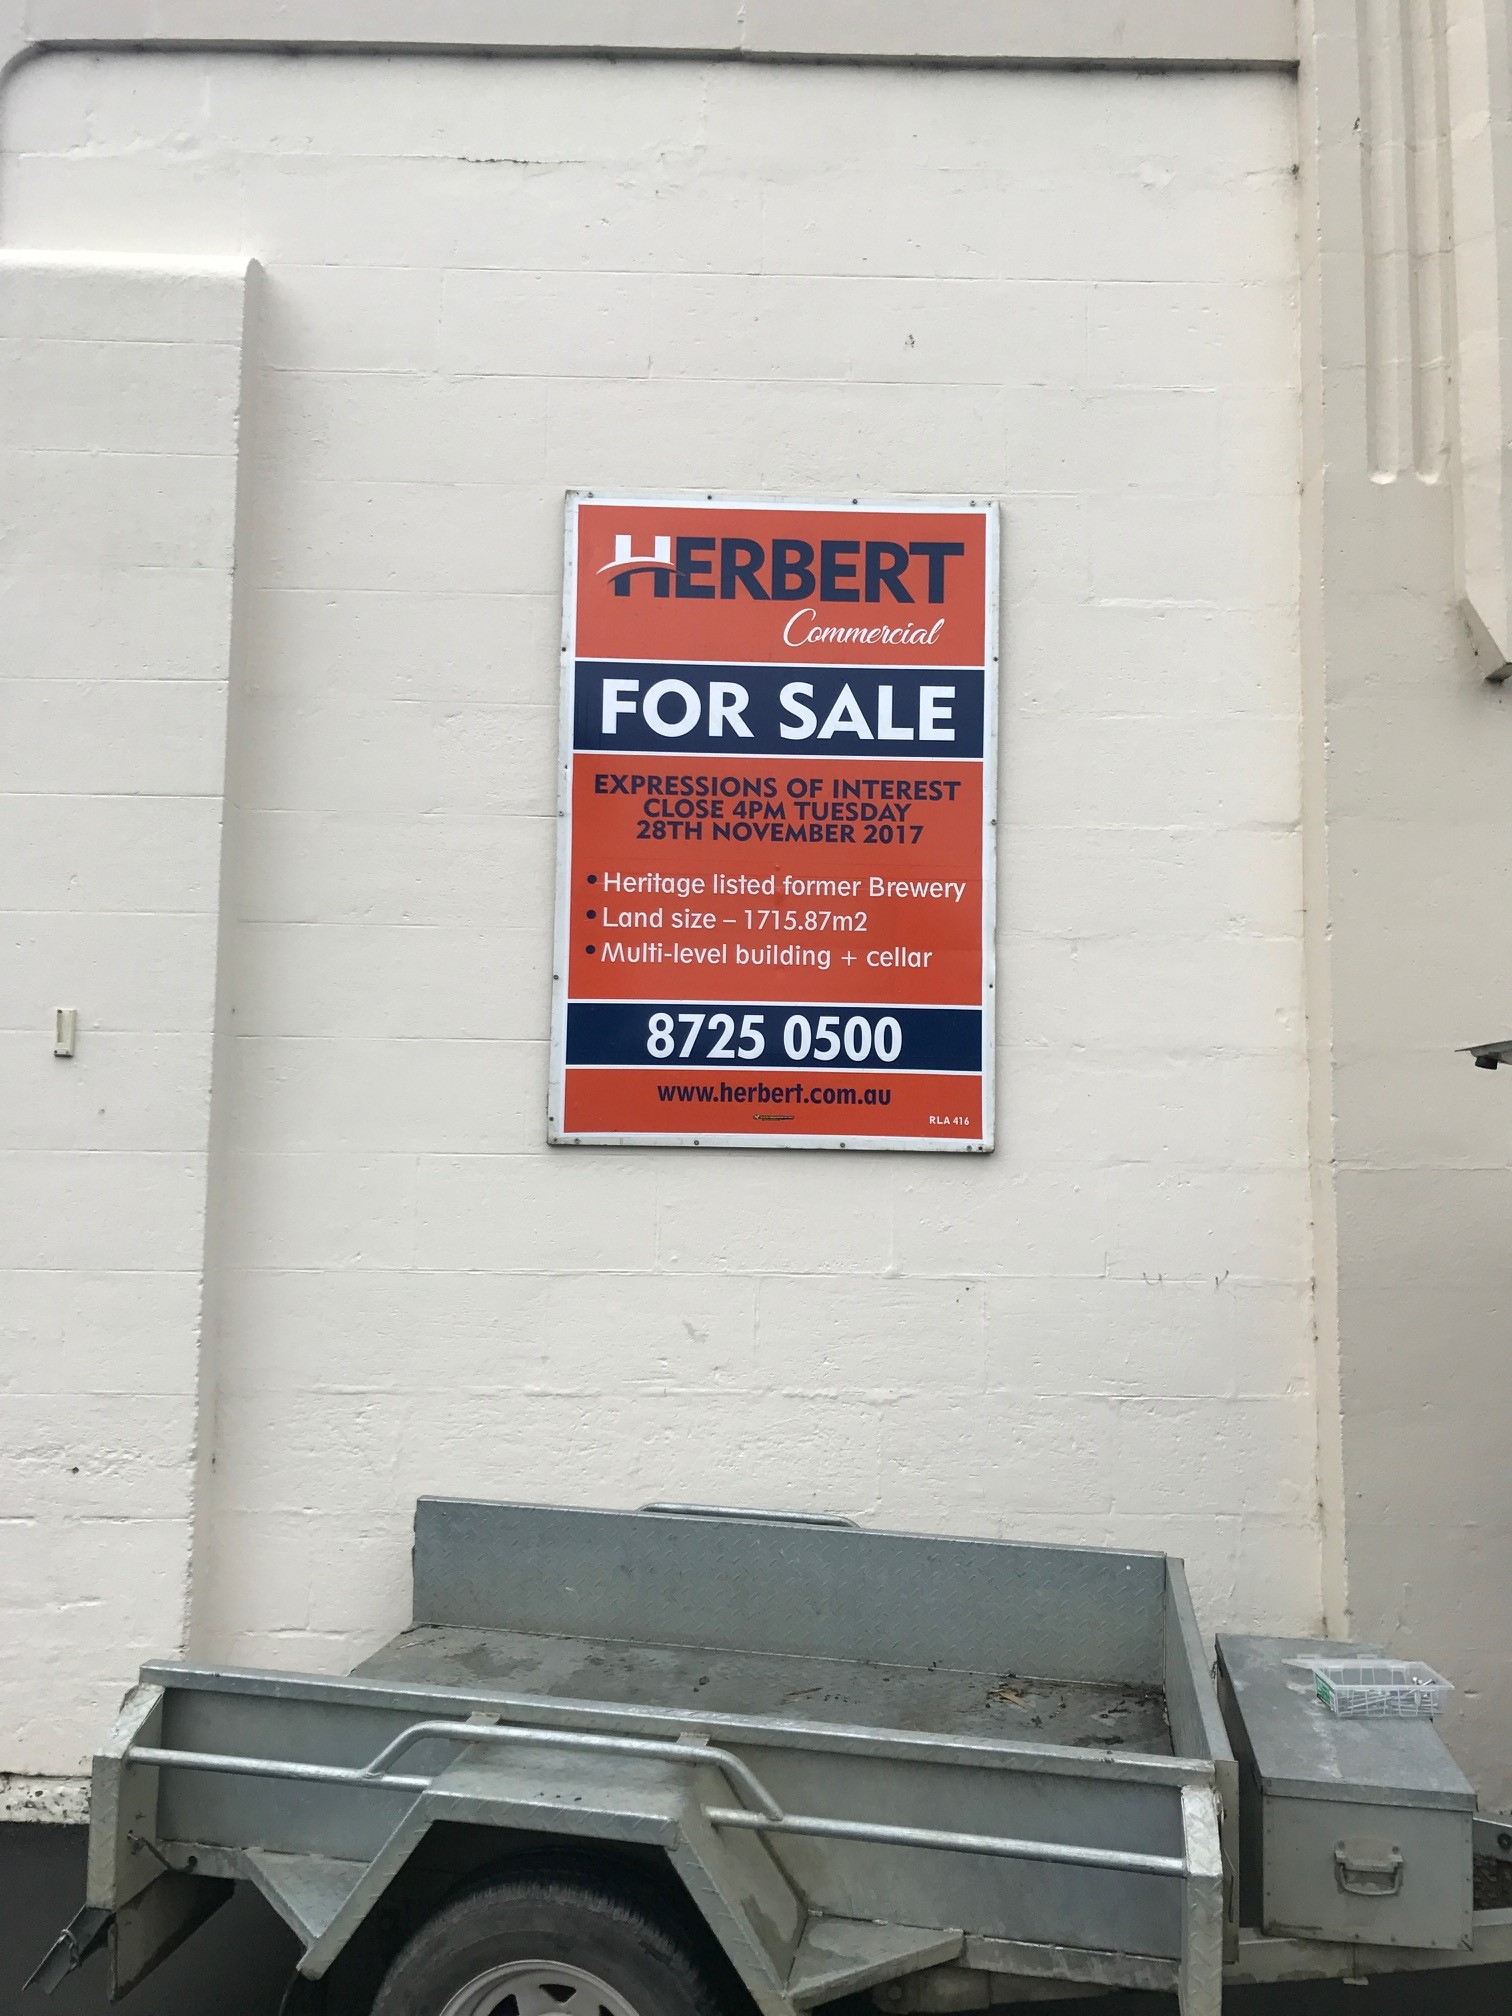 Herbert Commercial For Sale Sign